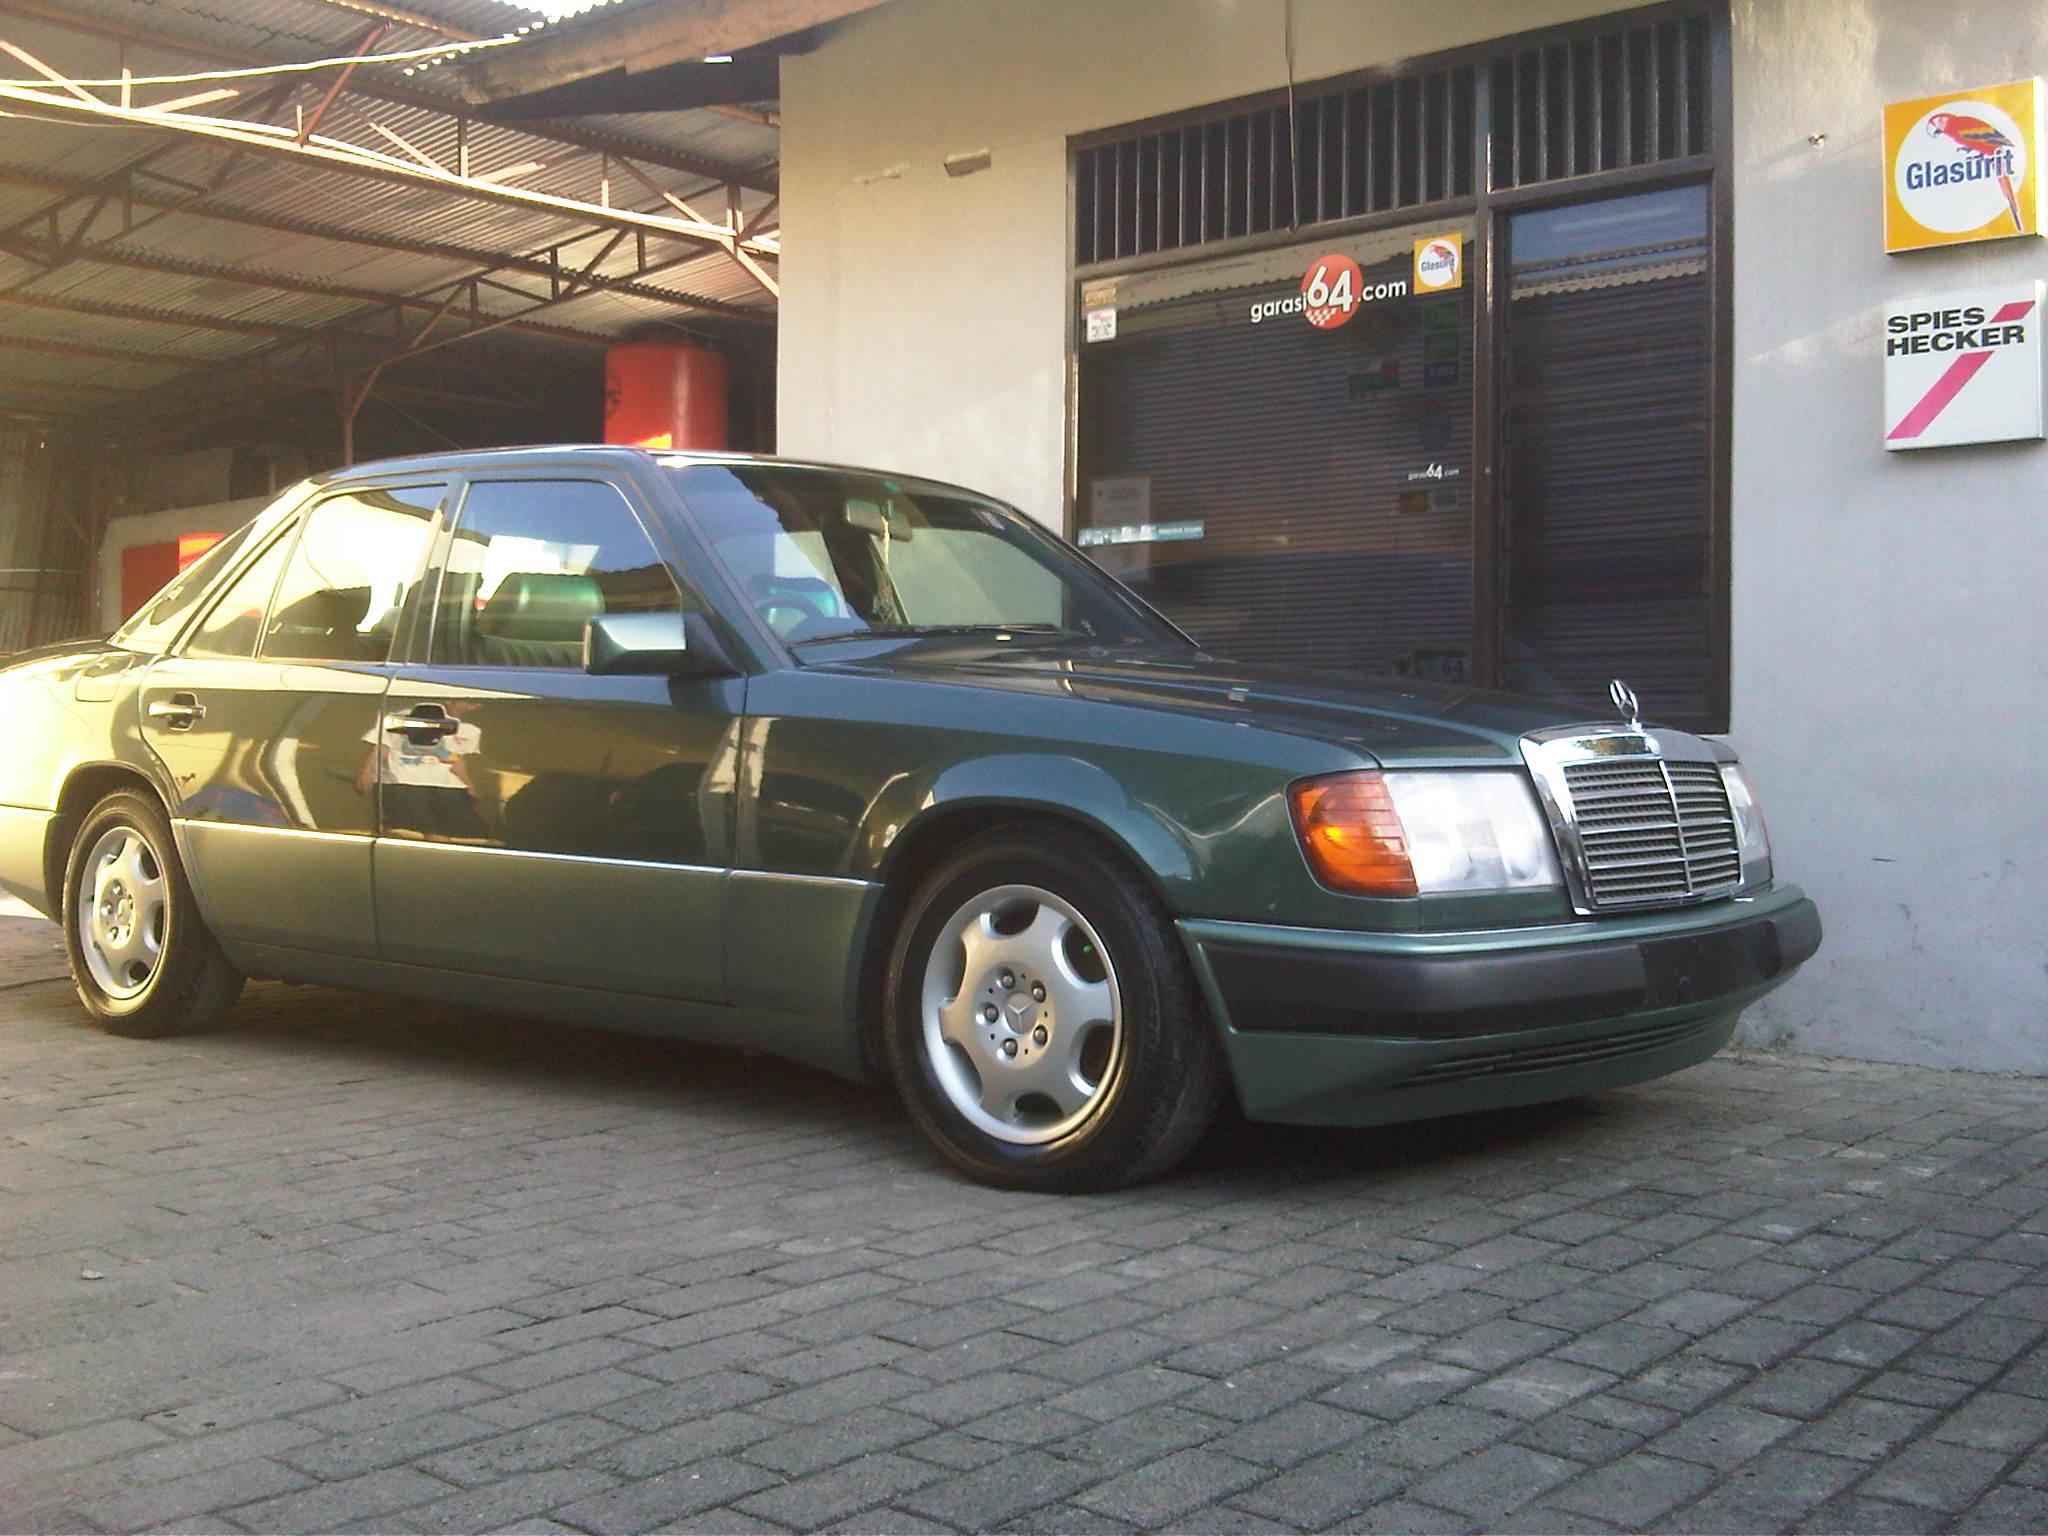 1991 Mercedes Benz 230E W124 | Garasi 64